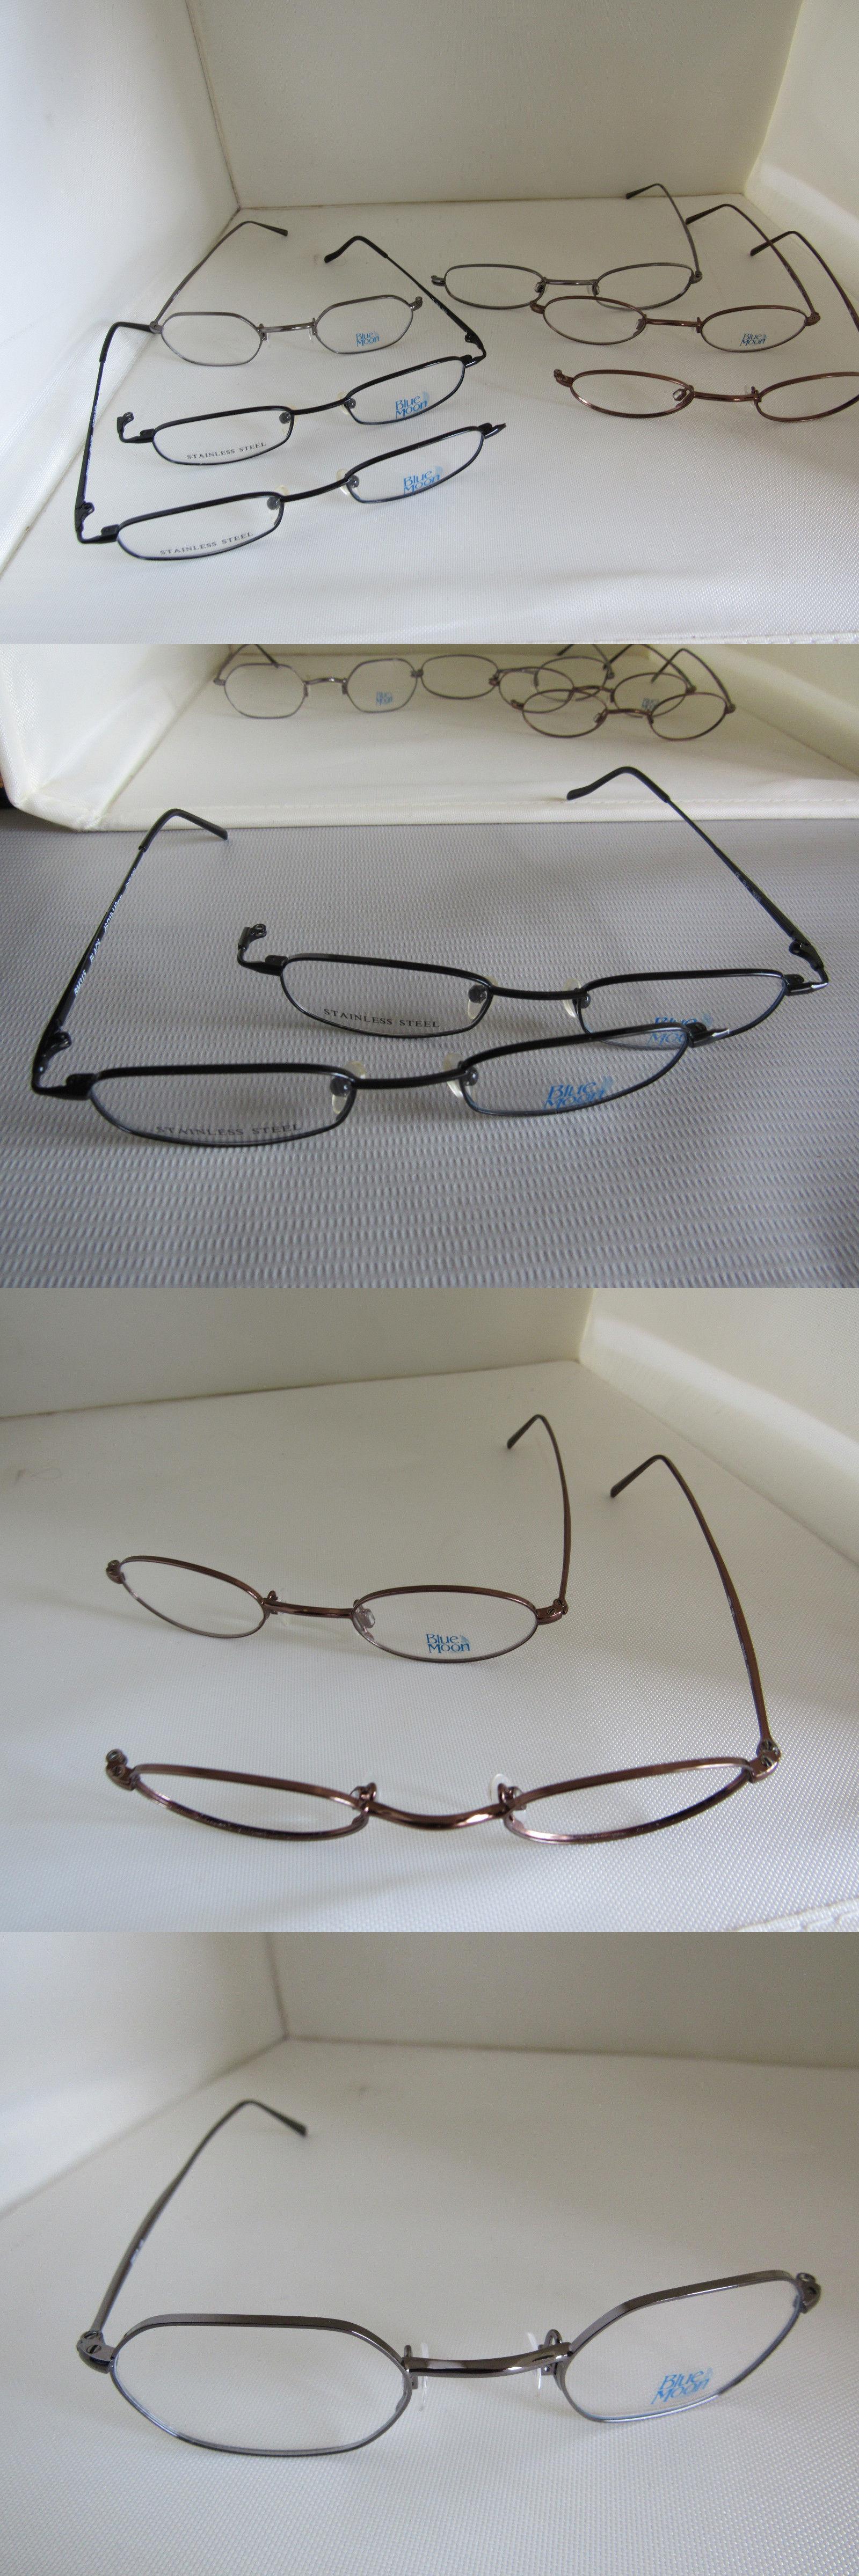 Eyeglass Cases: Lot Of 6 Nos Blue Moon Eyeglass Metal Frames Only ...